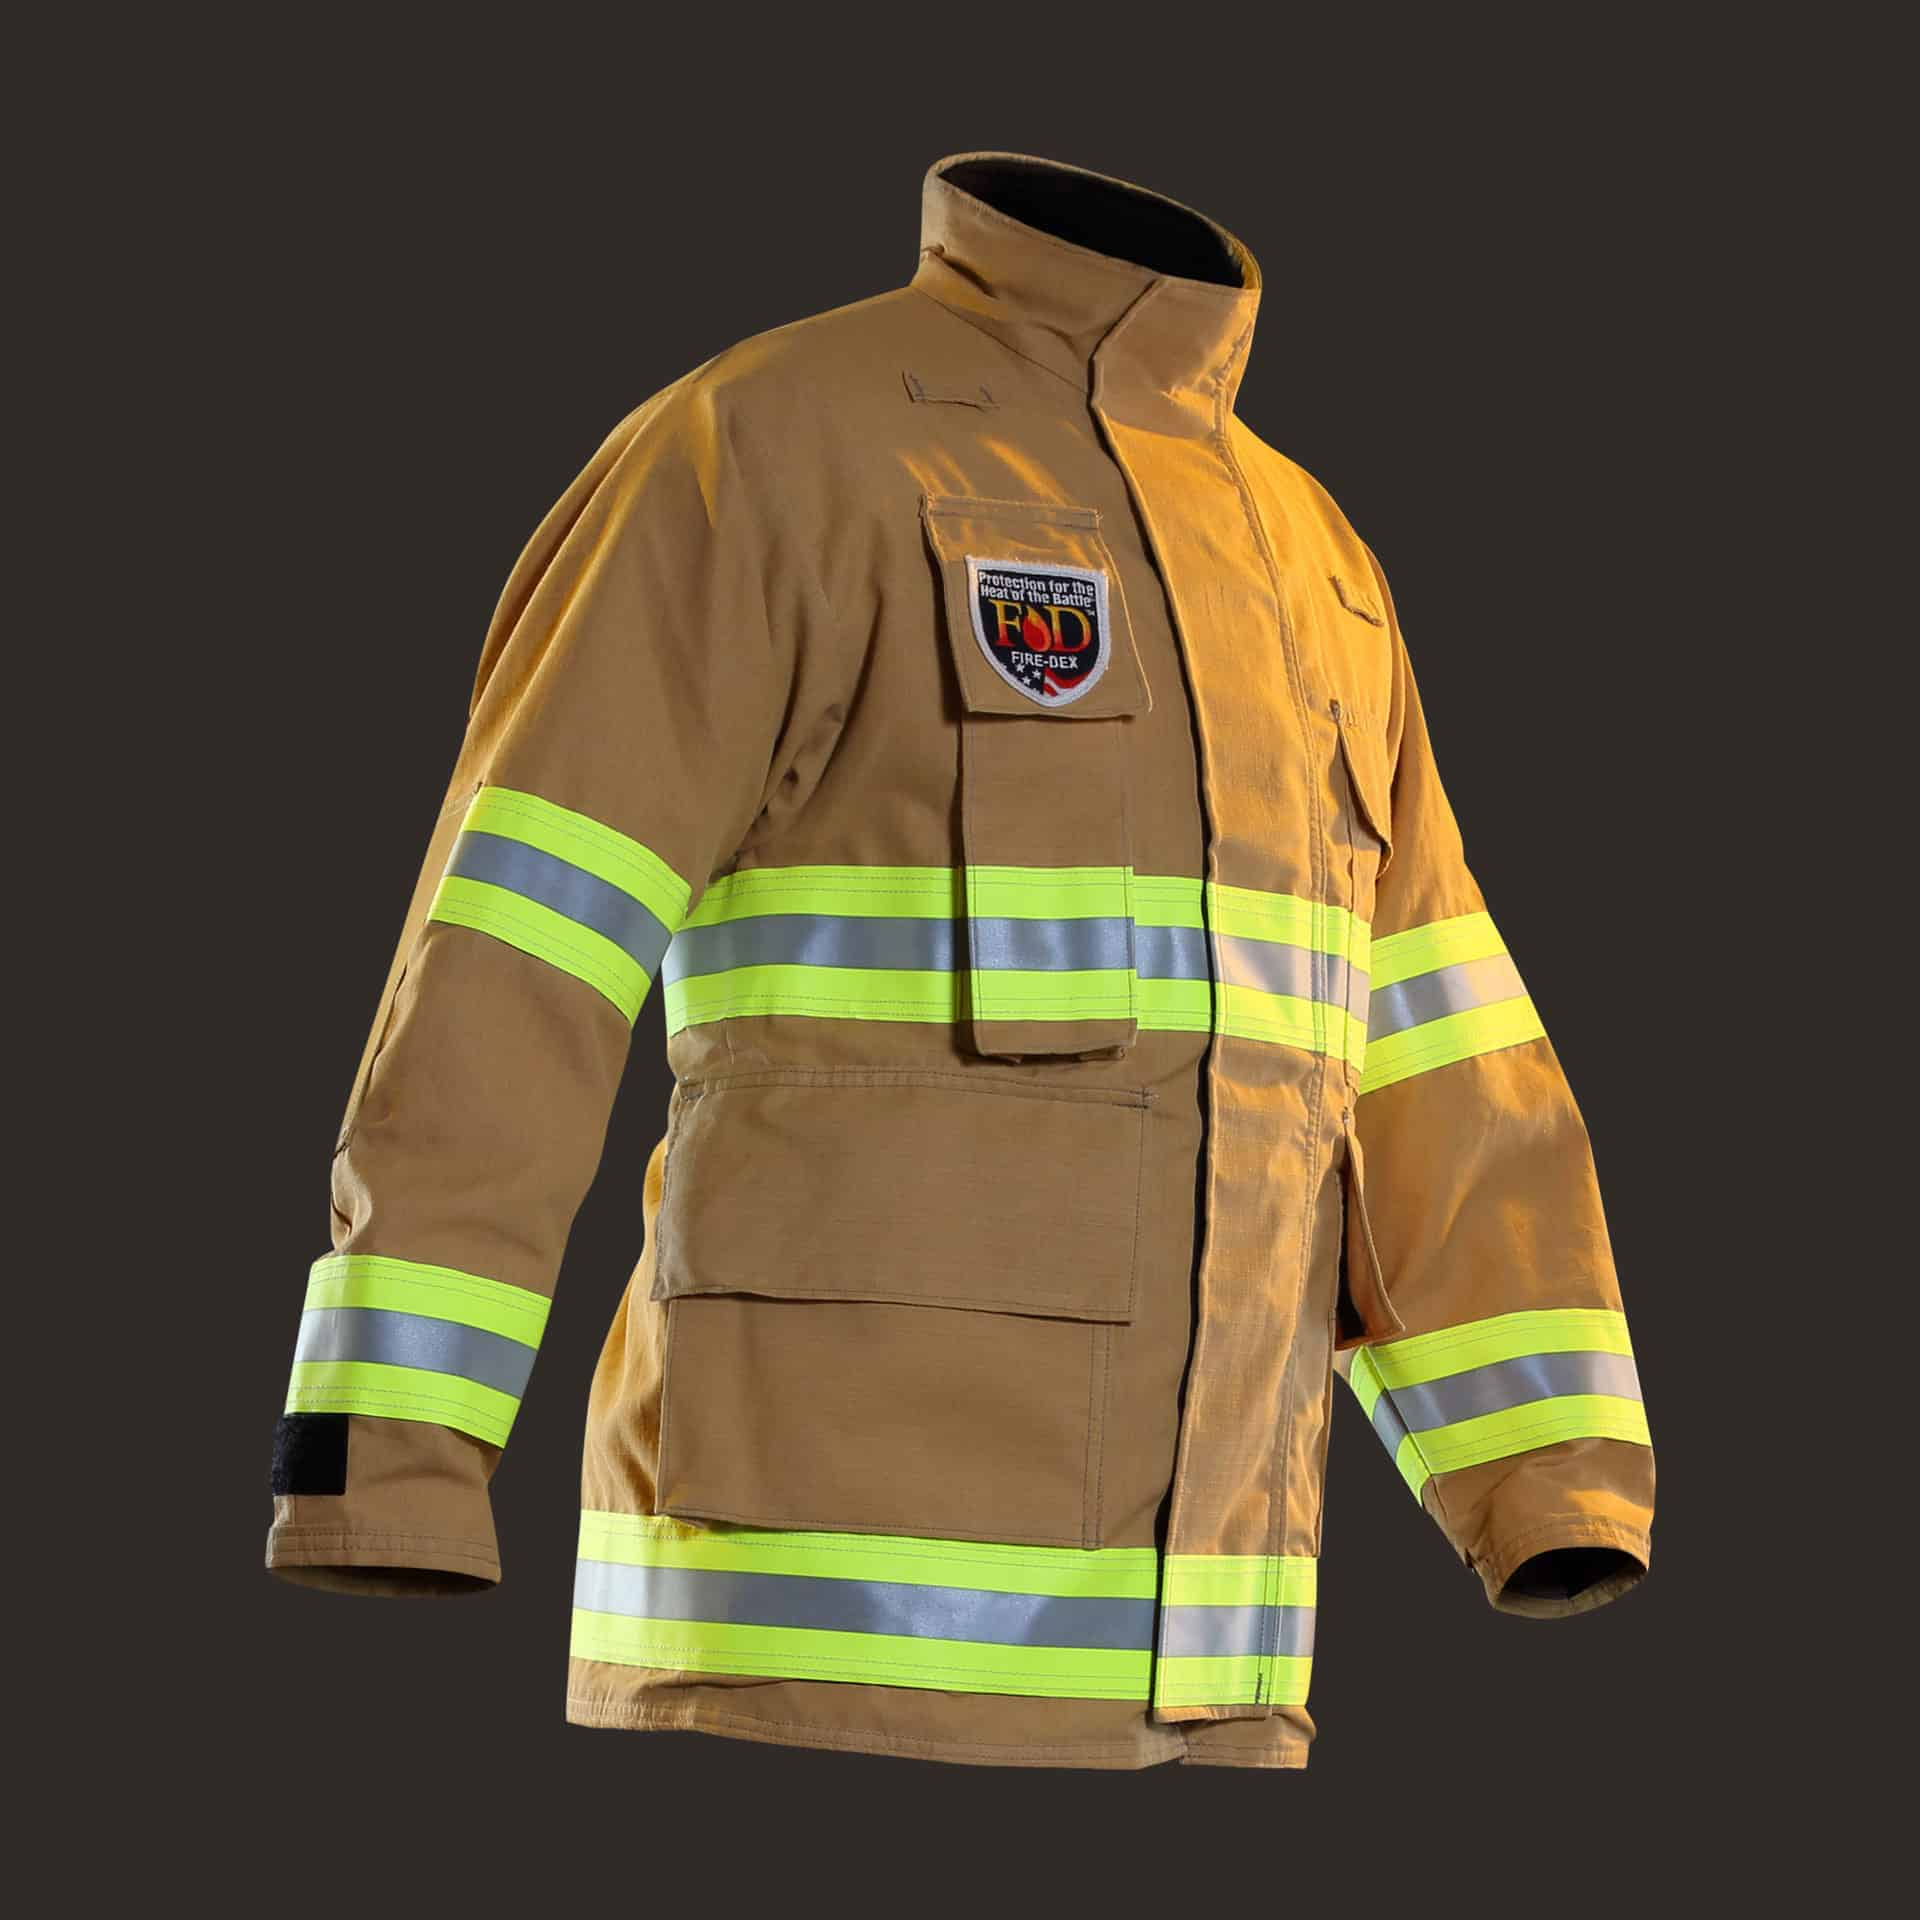 USAR Jacket in Millenia Light